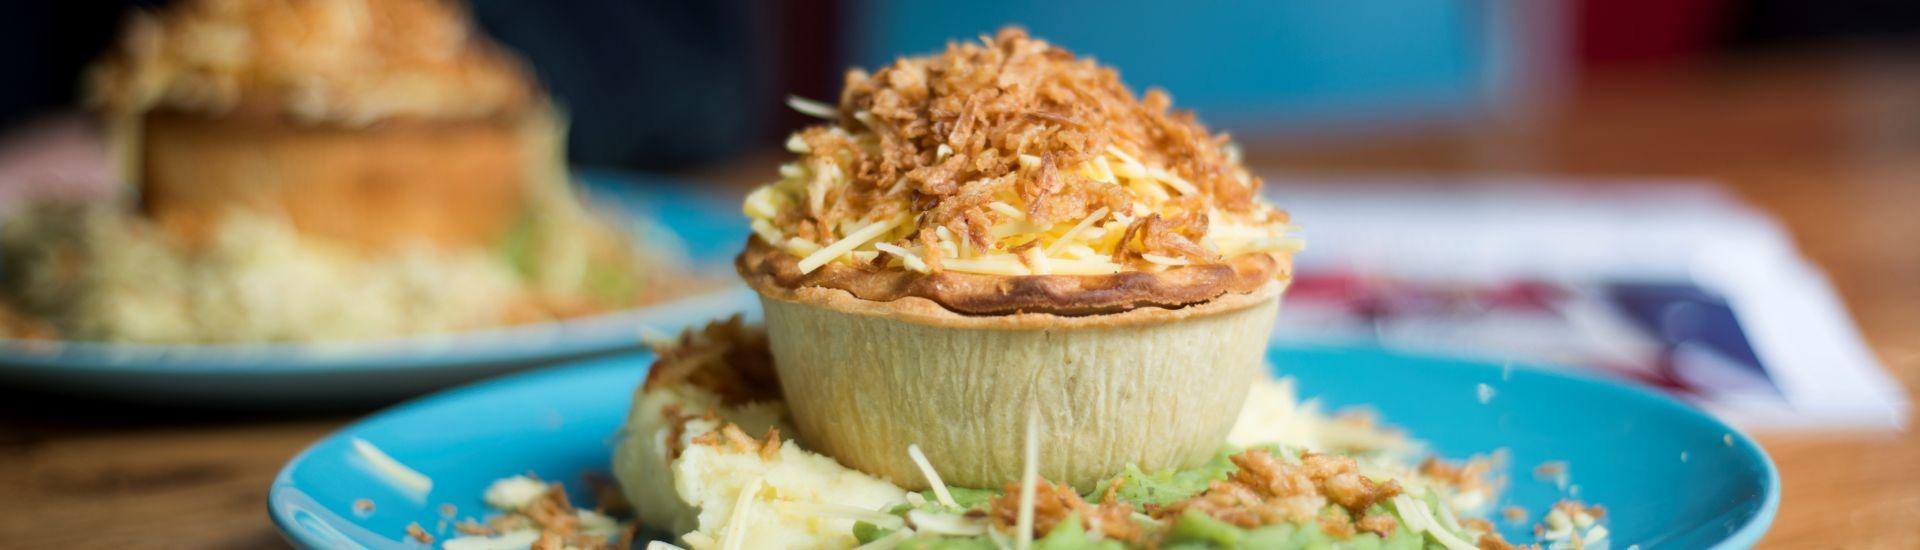 Five Must-Try Vegan Eats in Southampton